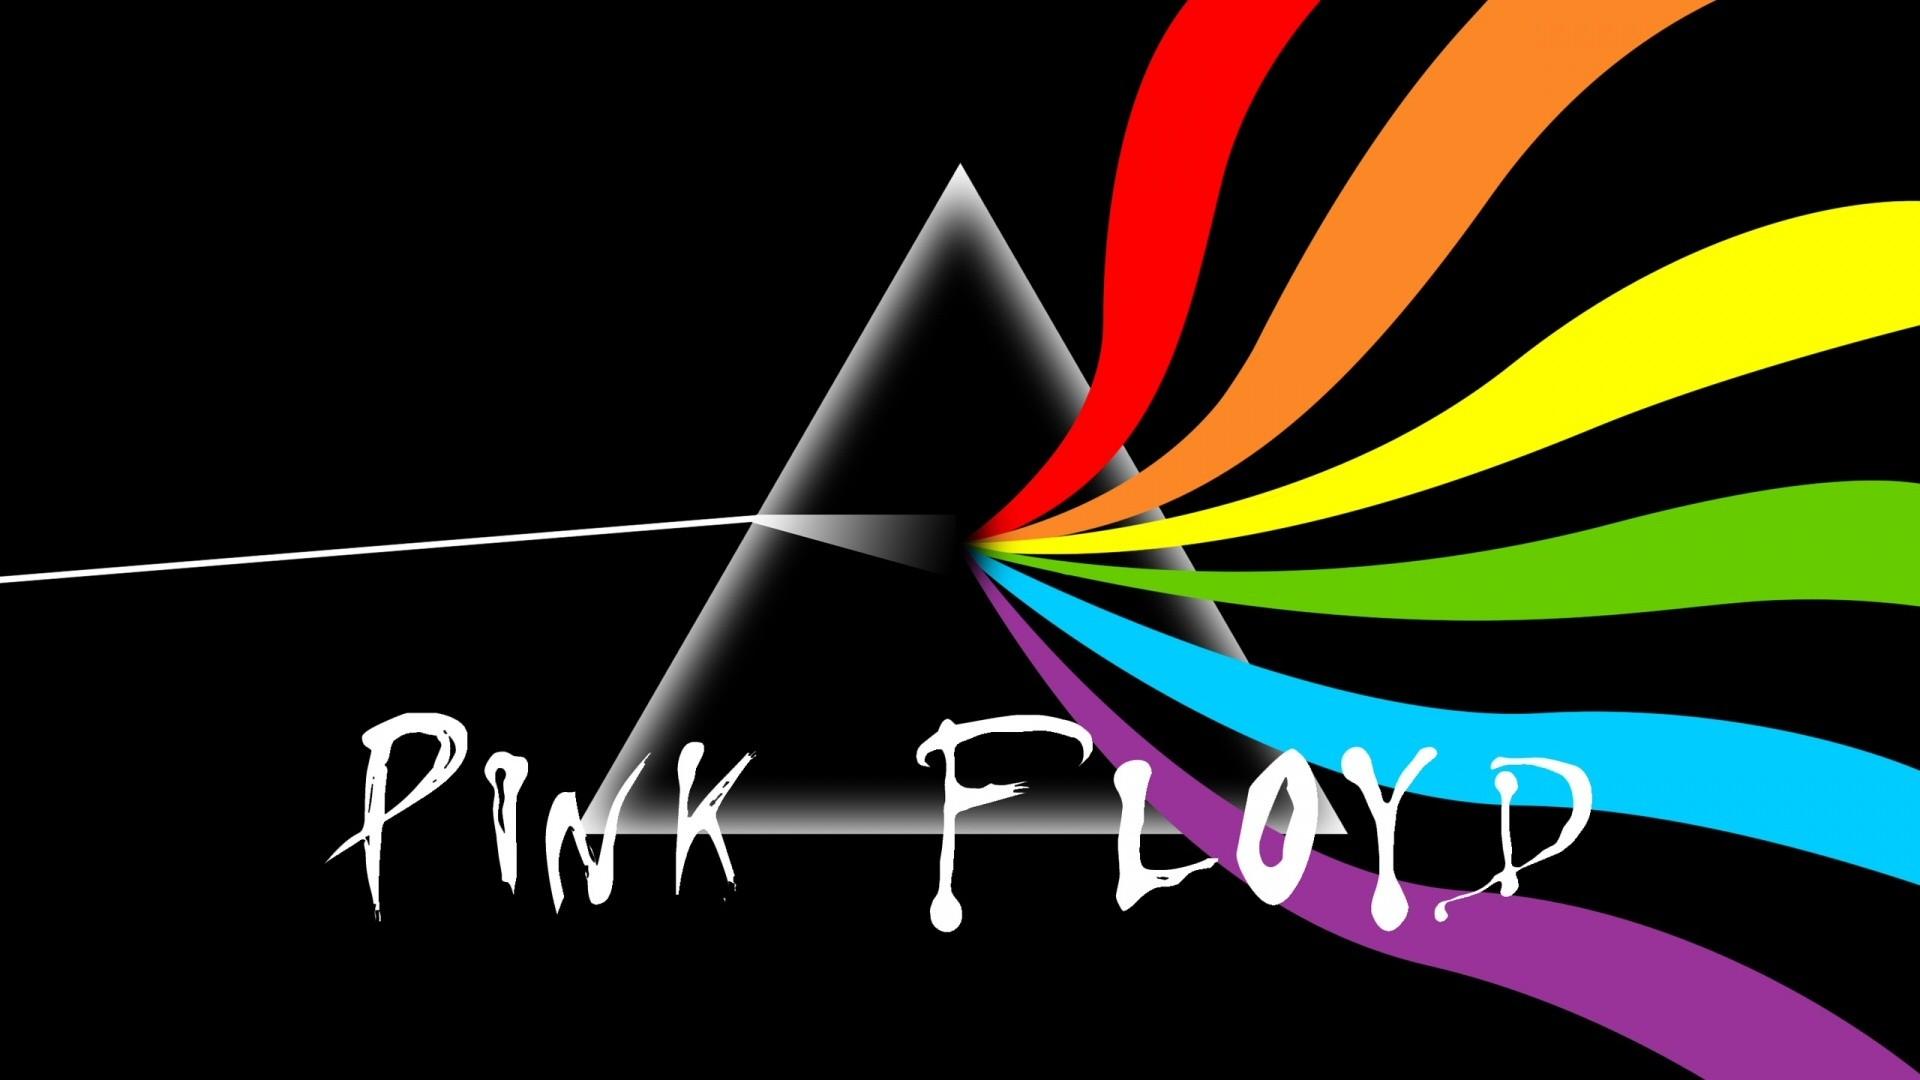 1080x1920 Http://wallpaperformobile.org/13962/pink Floyd Wallpapers.